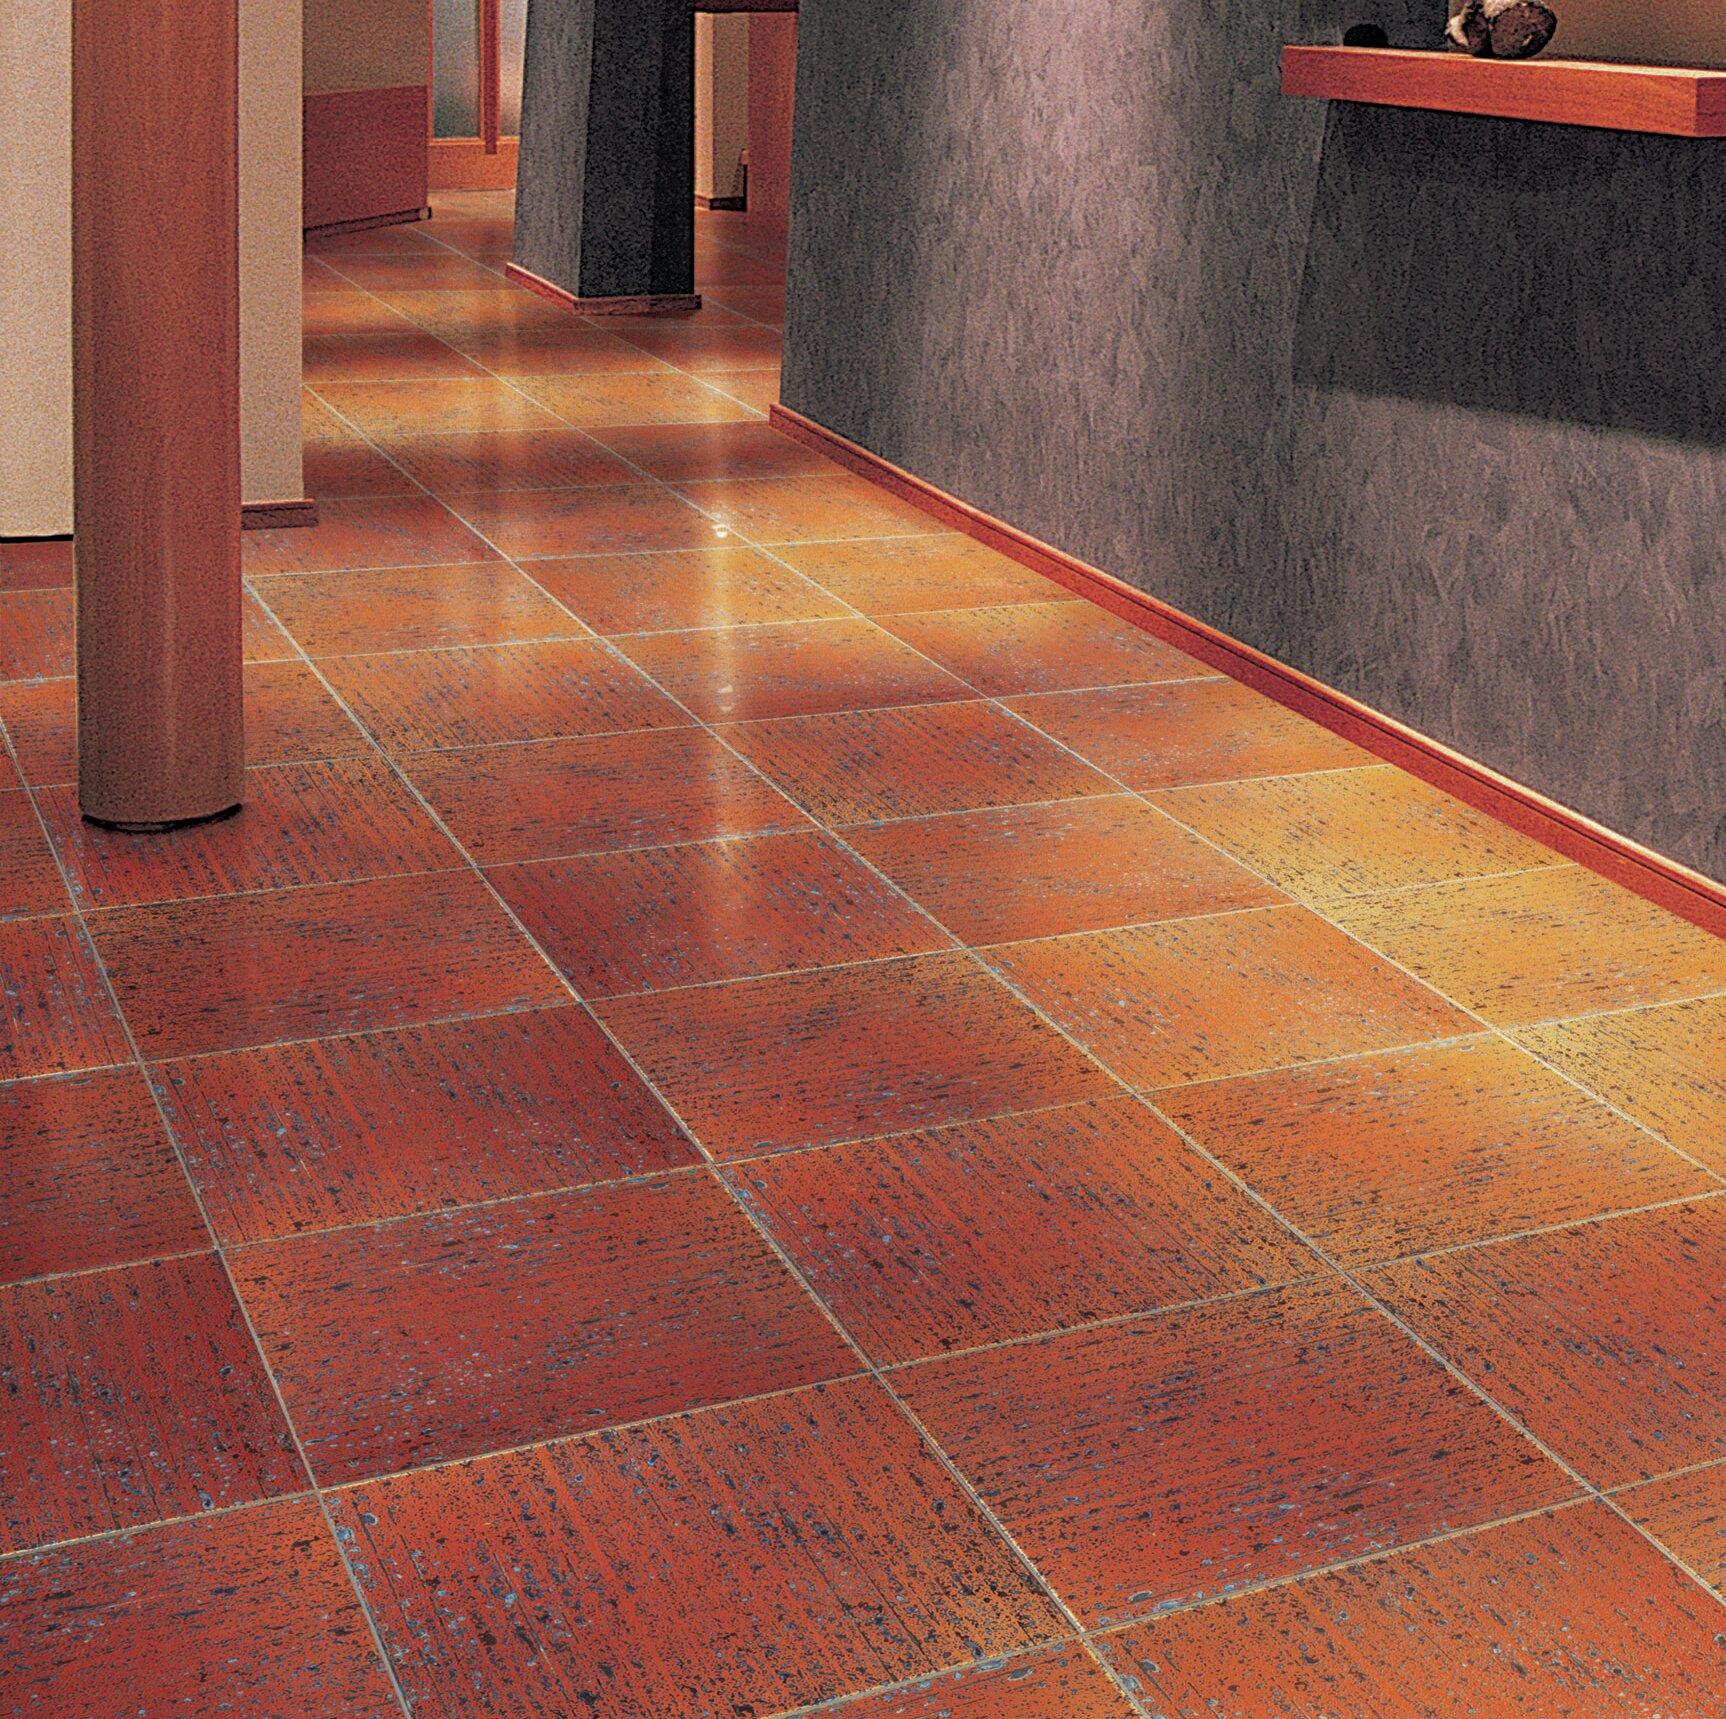 - Imagine Tile, Inc. Metro 4